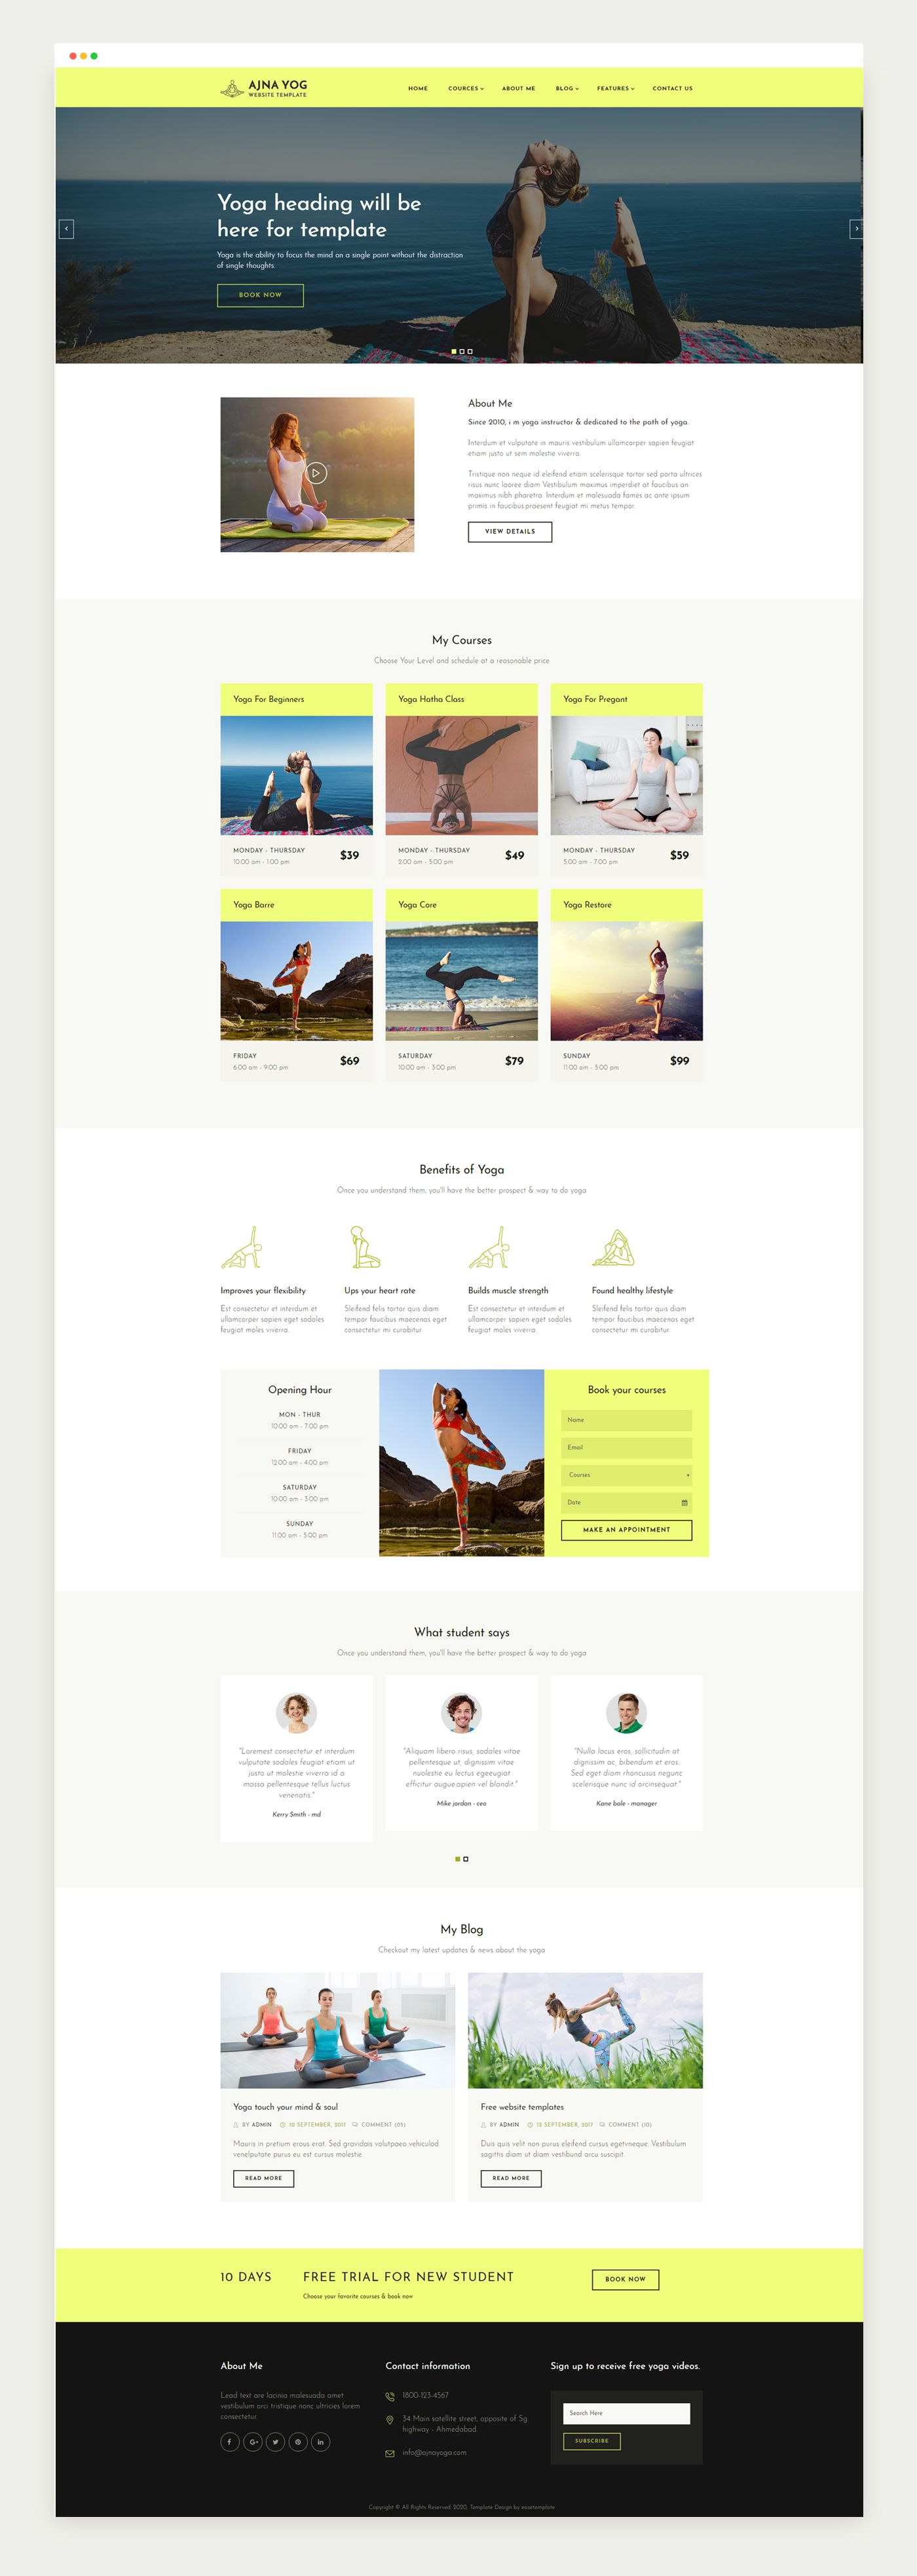 Ajna Yoga Instructor Responsive Web Templates On Behance